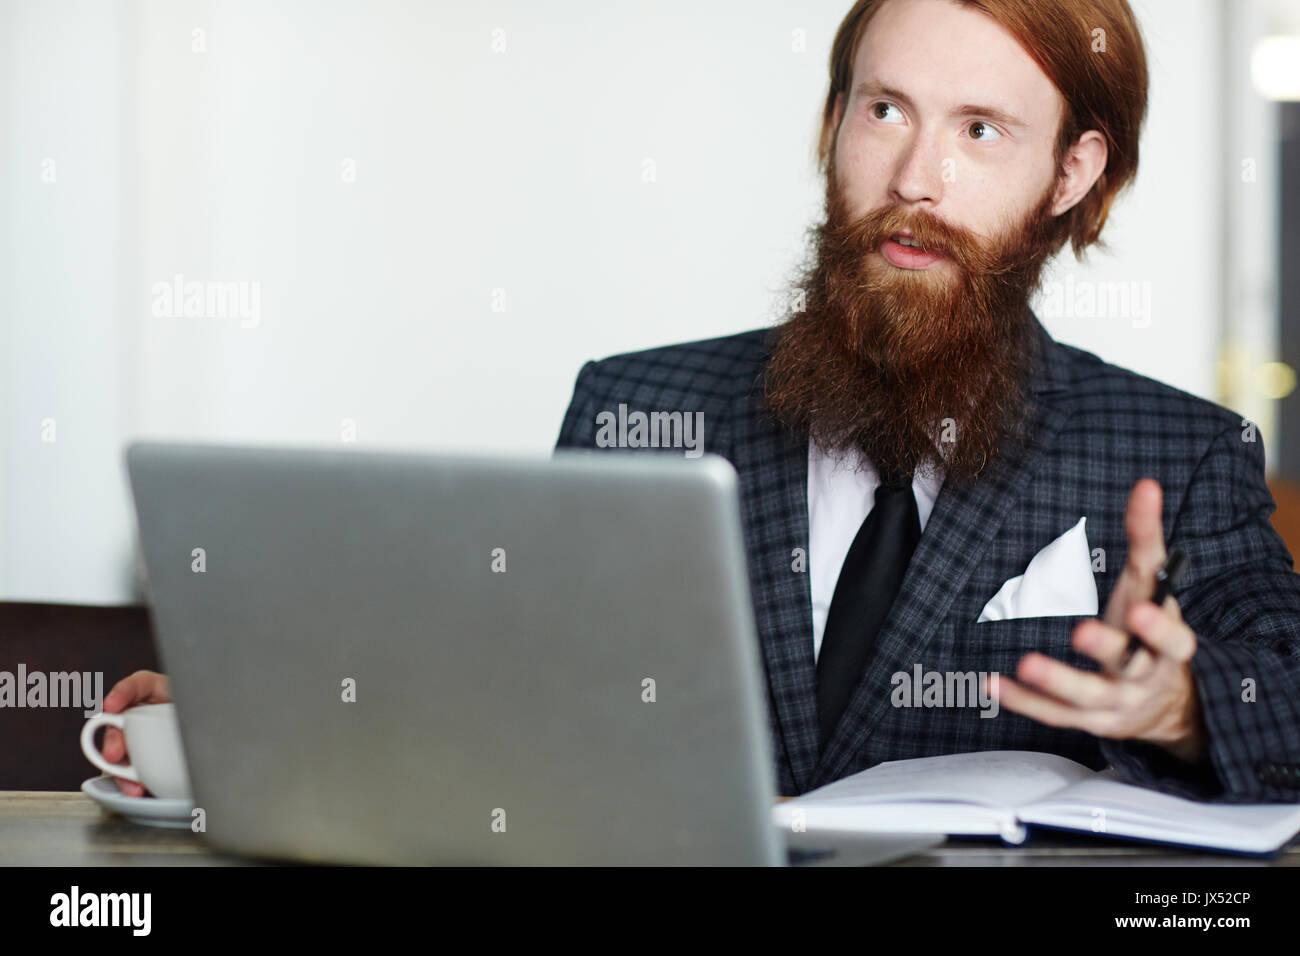 Online consultation - Stock Image